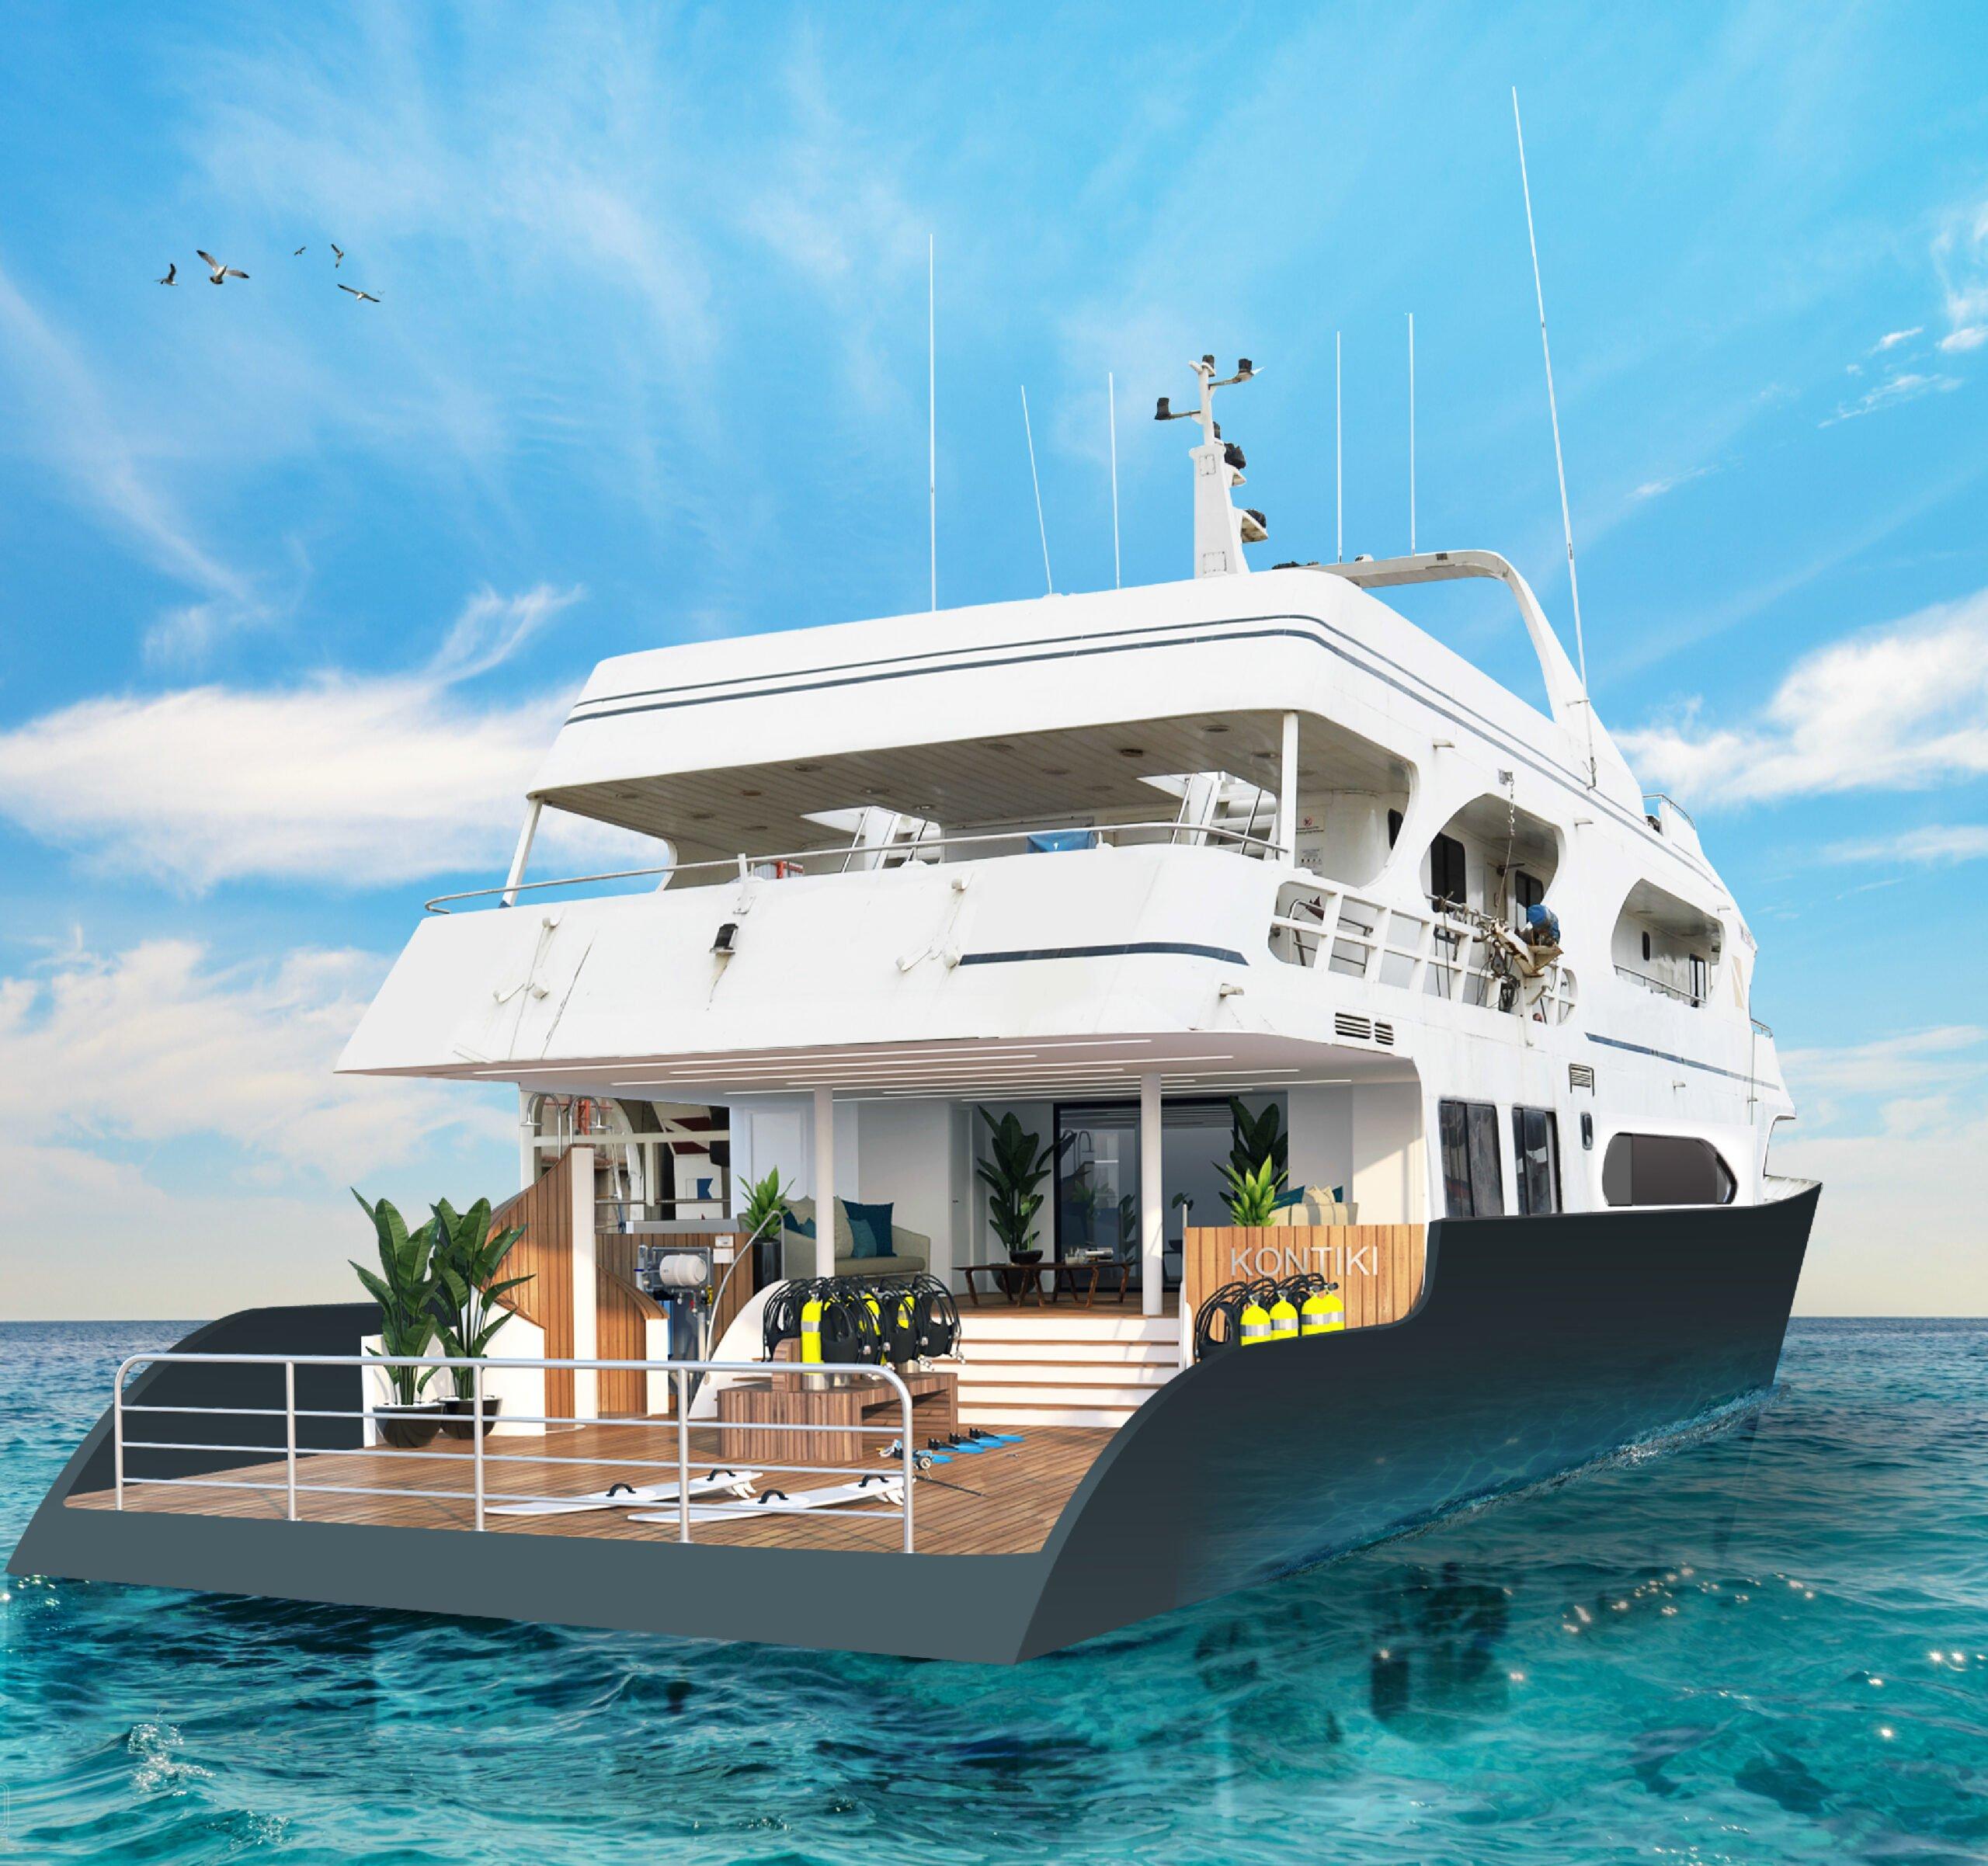 Yacht, Kontiki, 360 Magazine, Vaughn Lowery